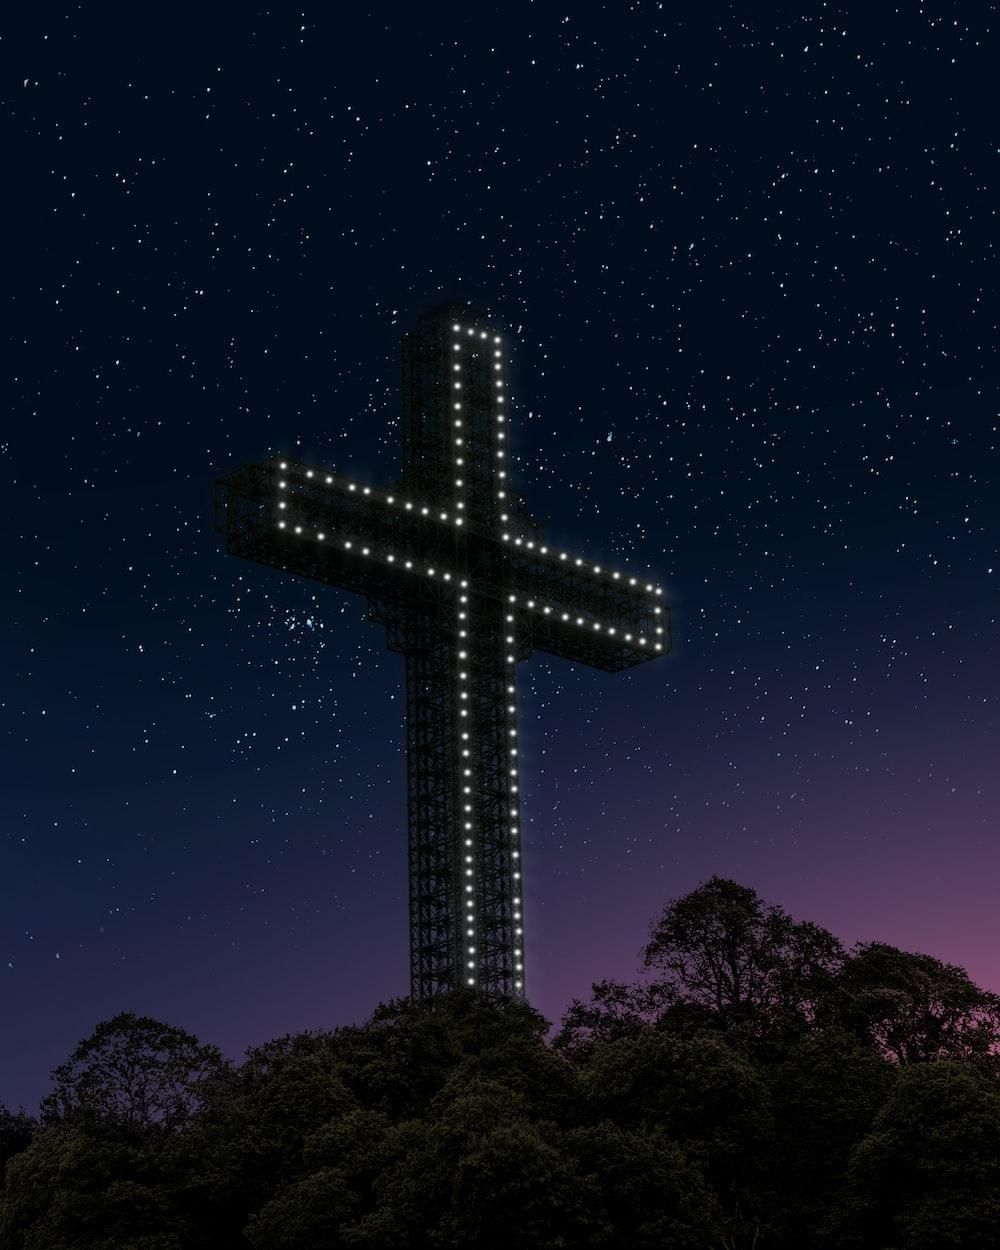 black cross under blue sky during night time